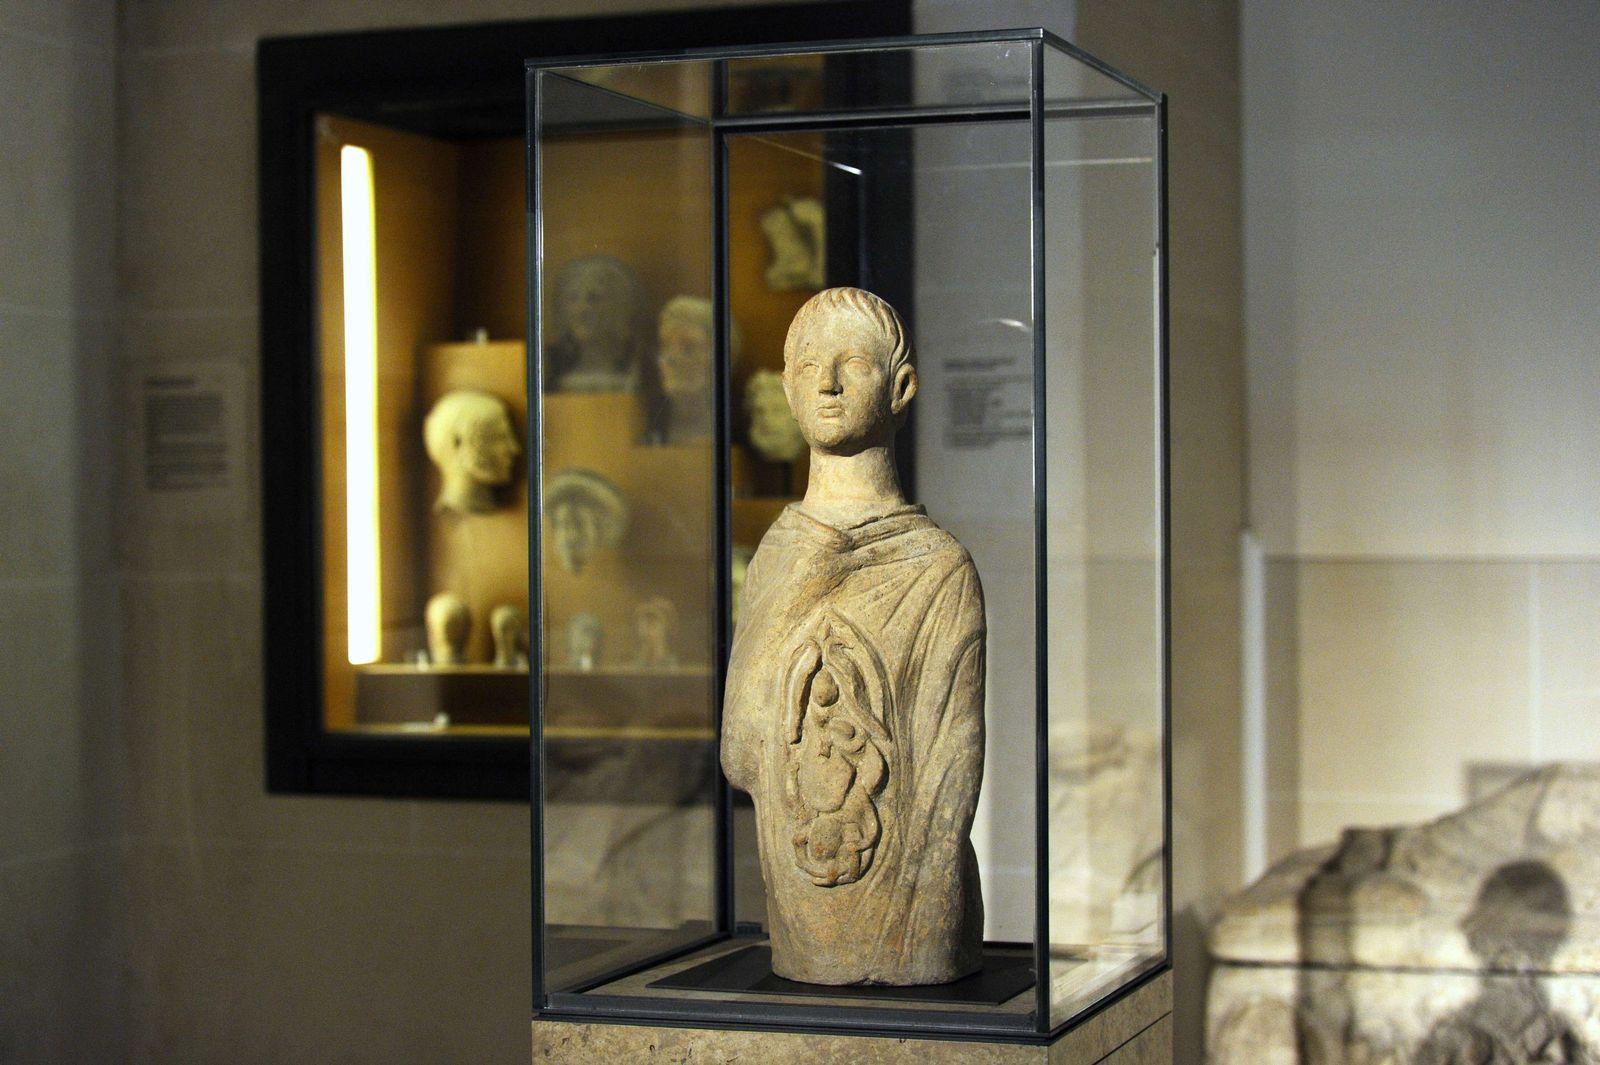 Louvre / Innereien-Statue